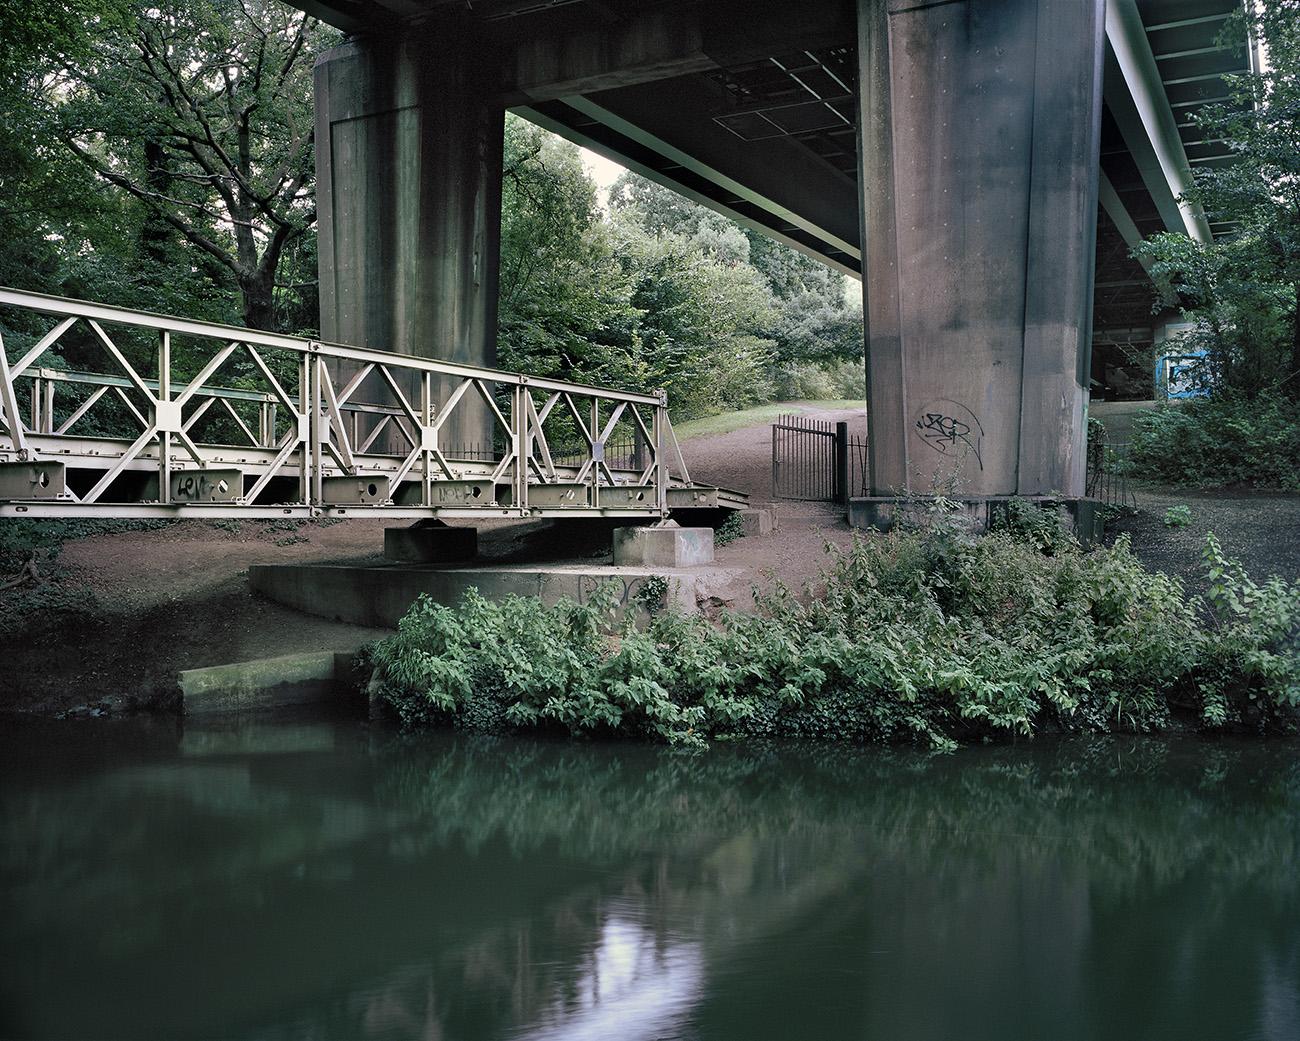 The walkway shot by Andrew Meredith beneath the M4 motorway